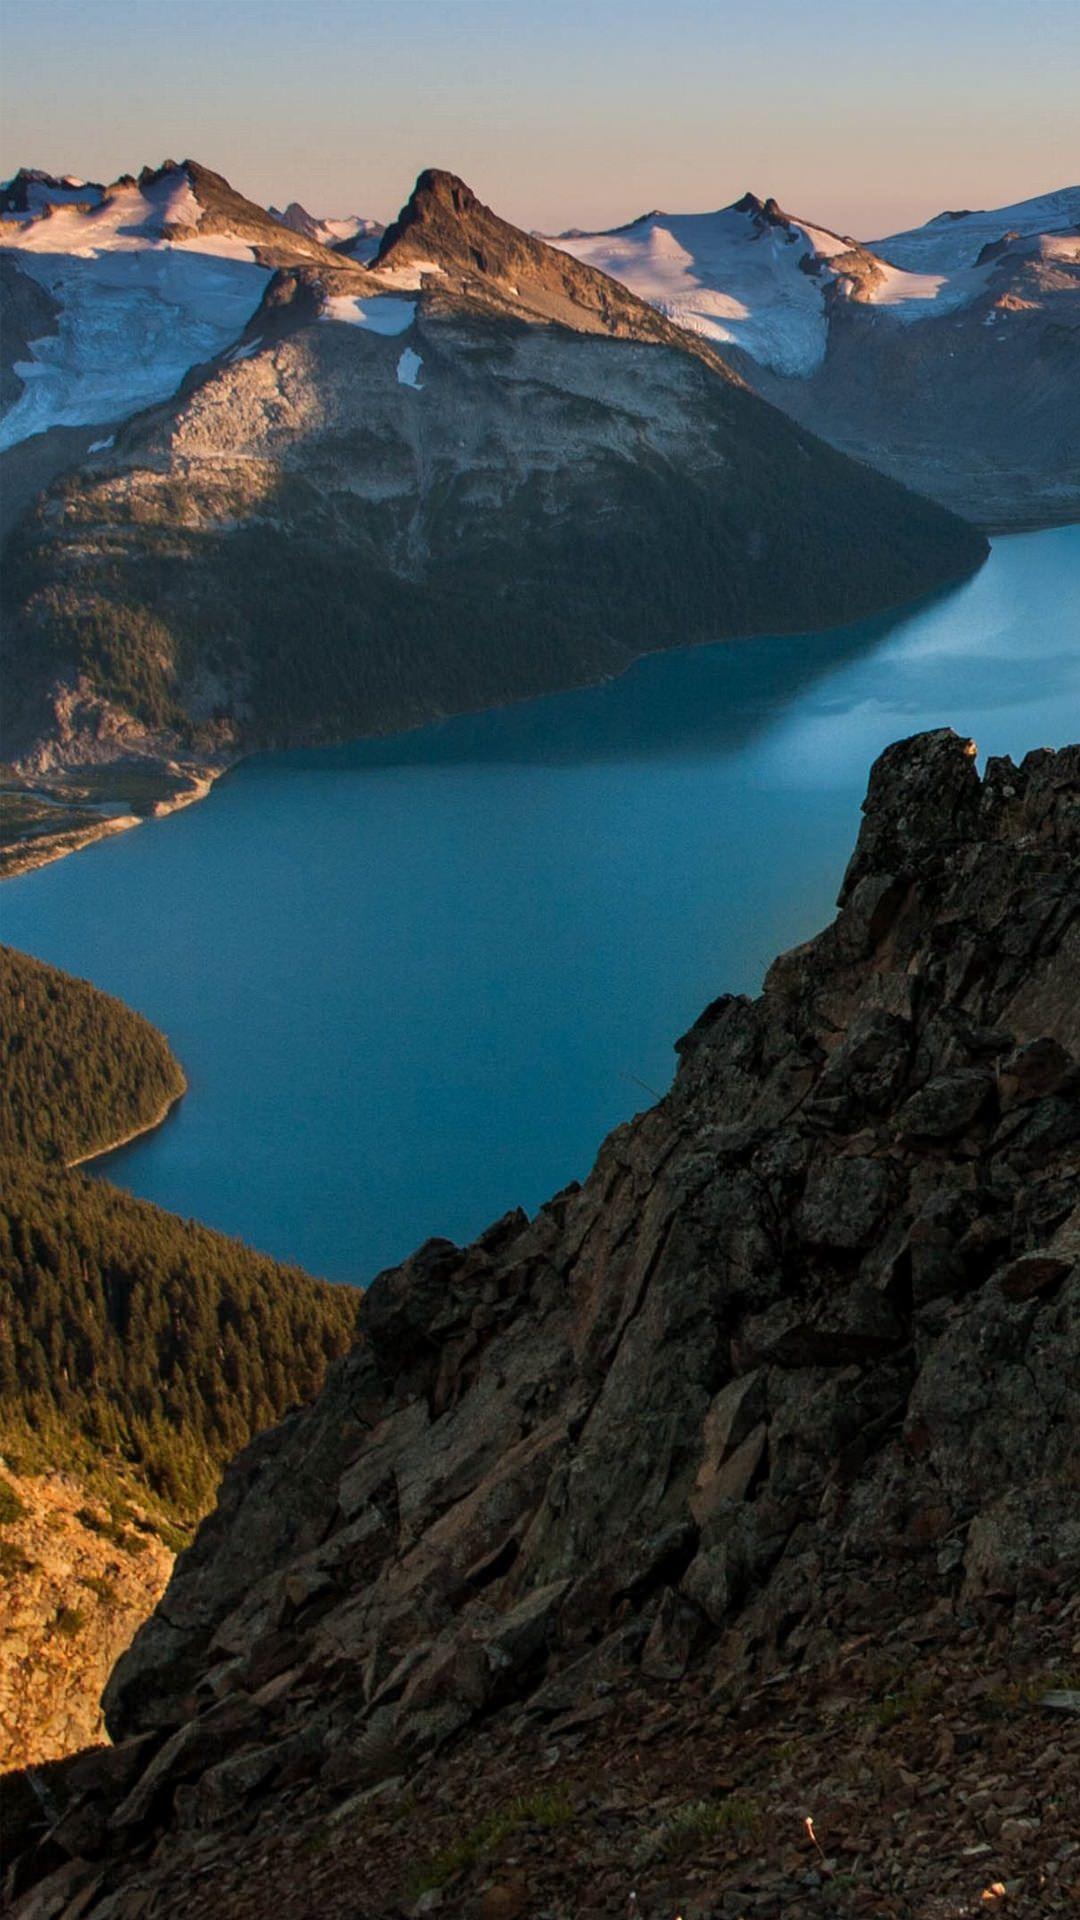 Mountain Wallpaper Iphone mountain en 2020 Fond ecran